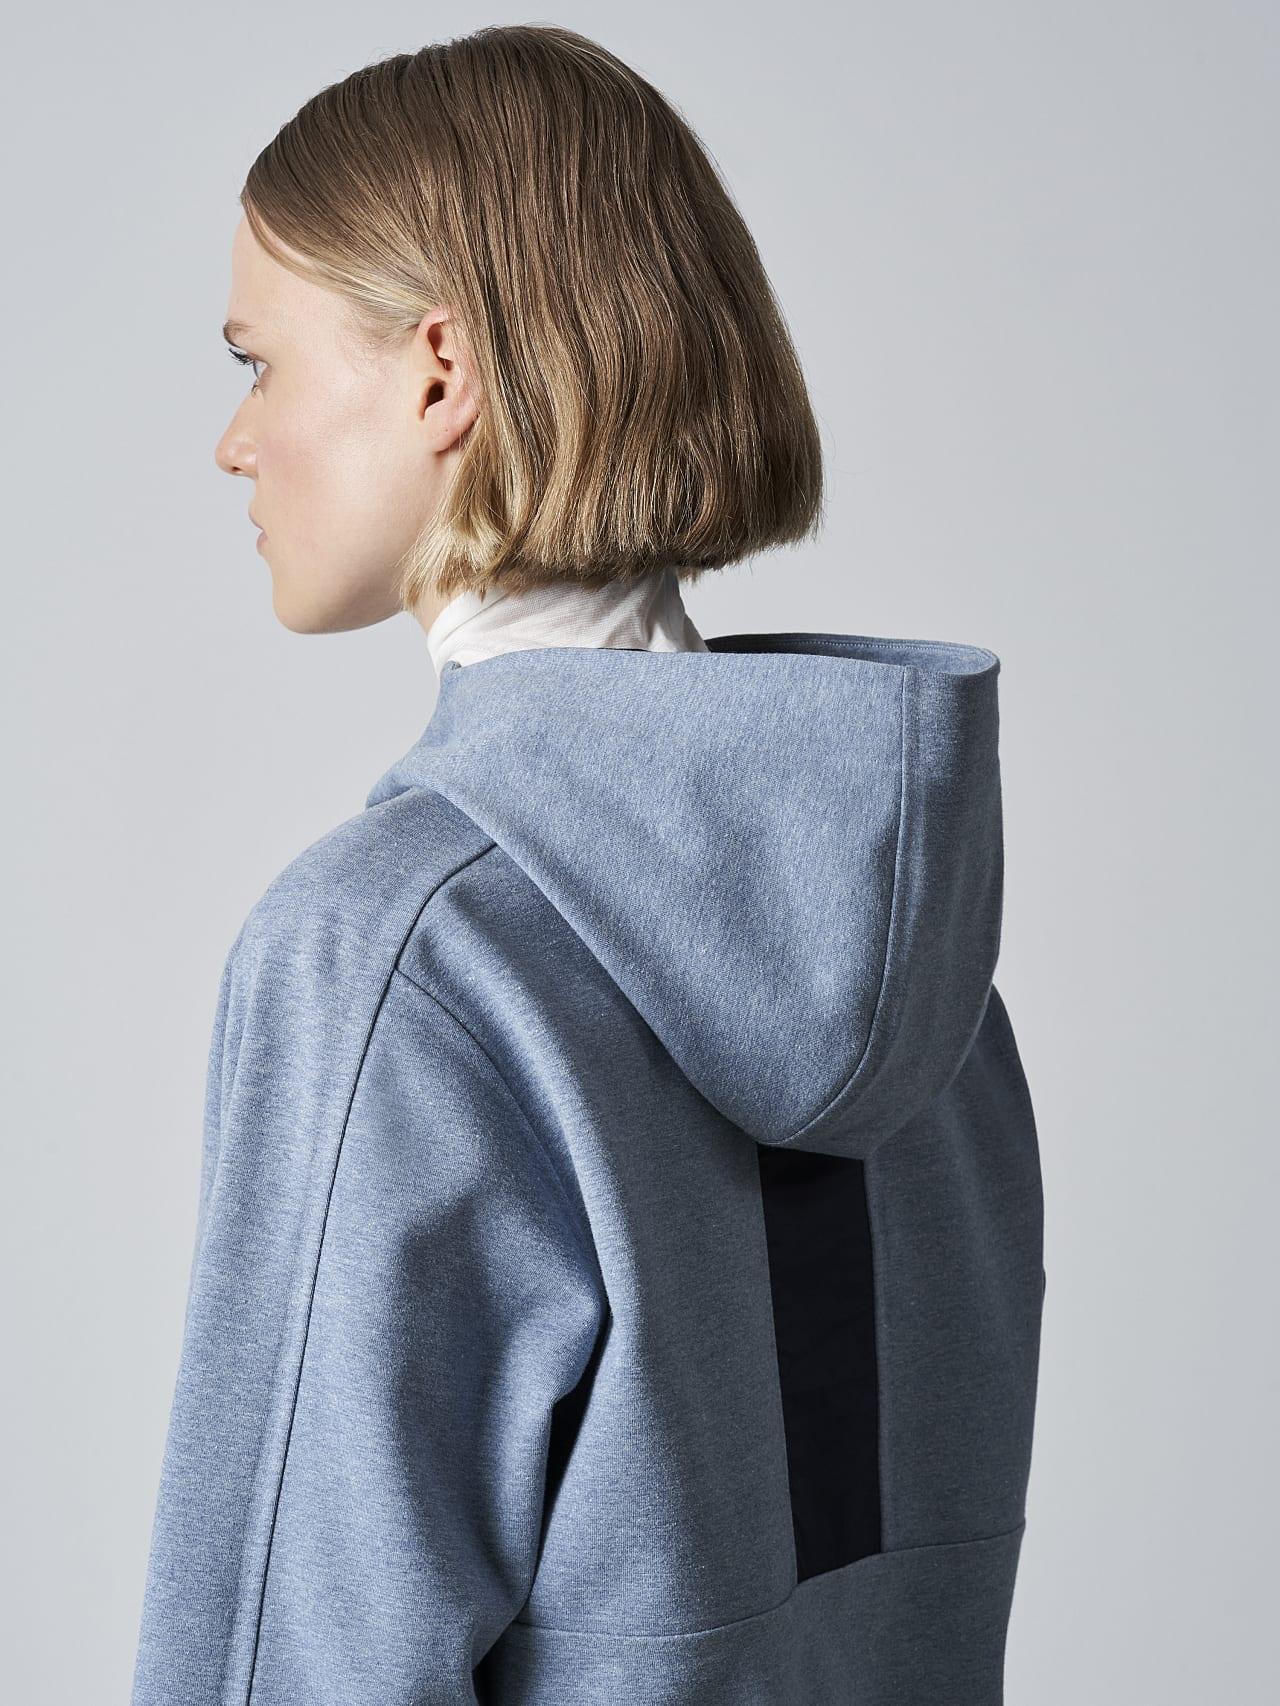 SINNO V2.Y5.02 Waterproof Hooded Jacket medium blue Extra Alpha Tauri